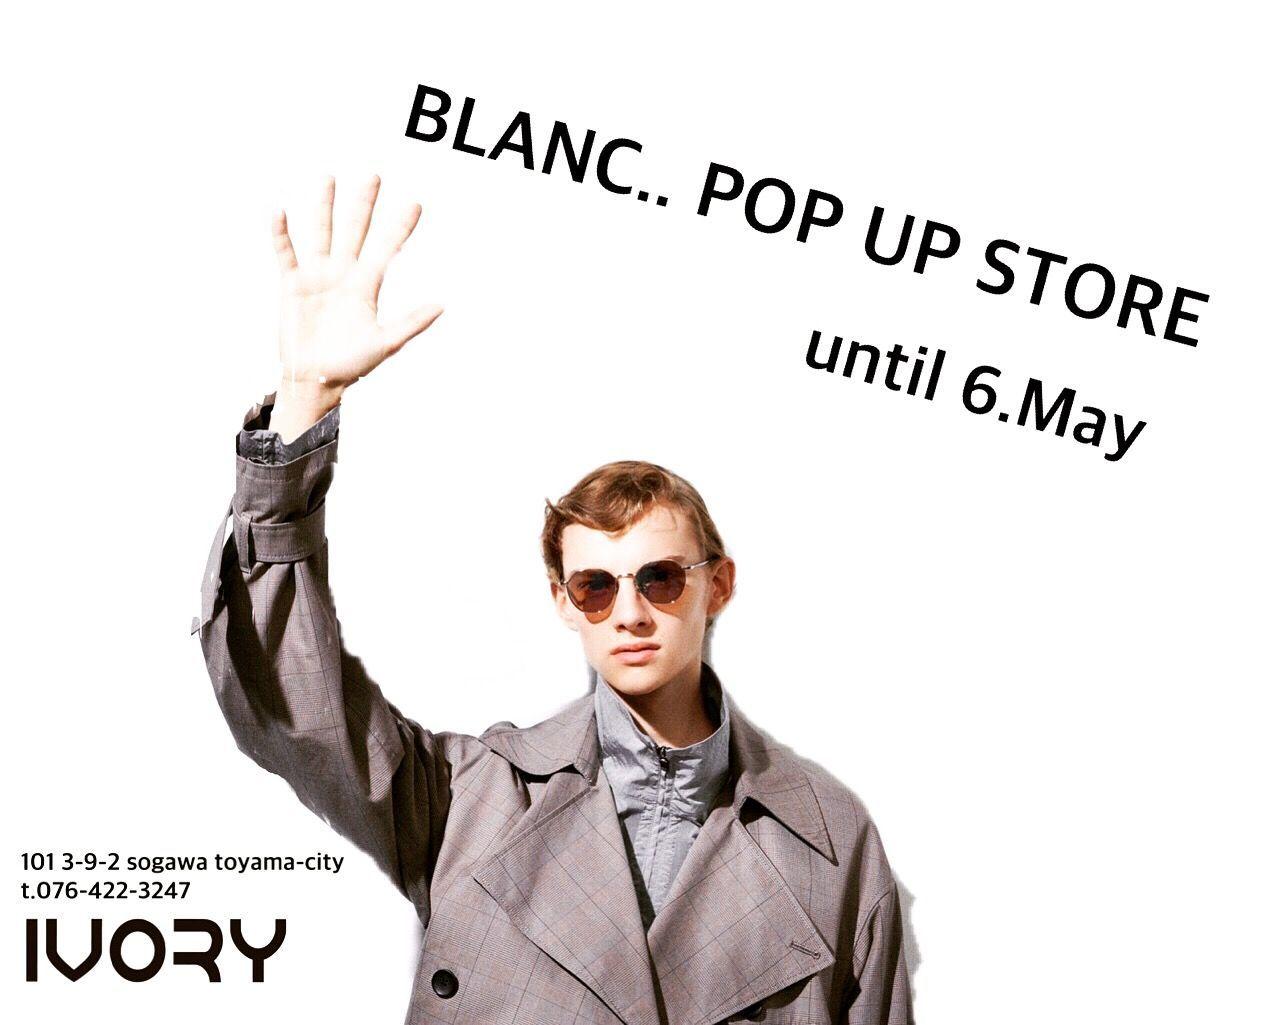 BLANC.. POP UP STORE !!の写真